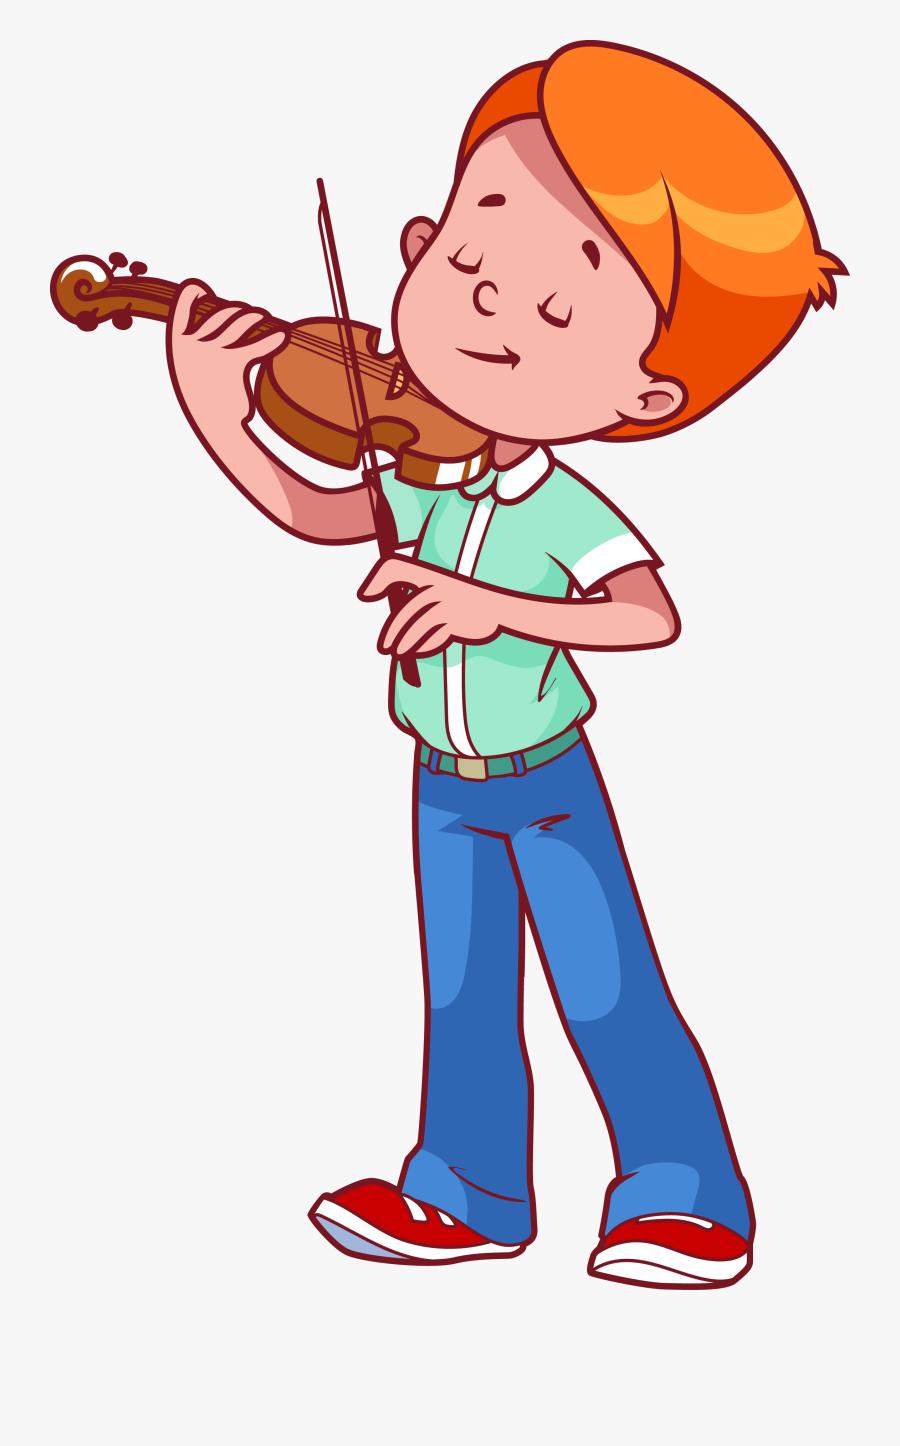 Transparent Instruments Clipart - Boy Playing Violin Clipart, Transparent Clipart